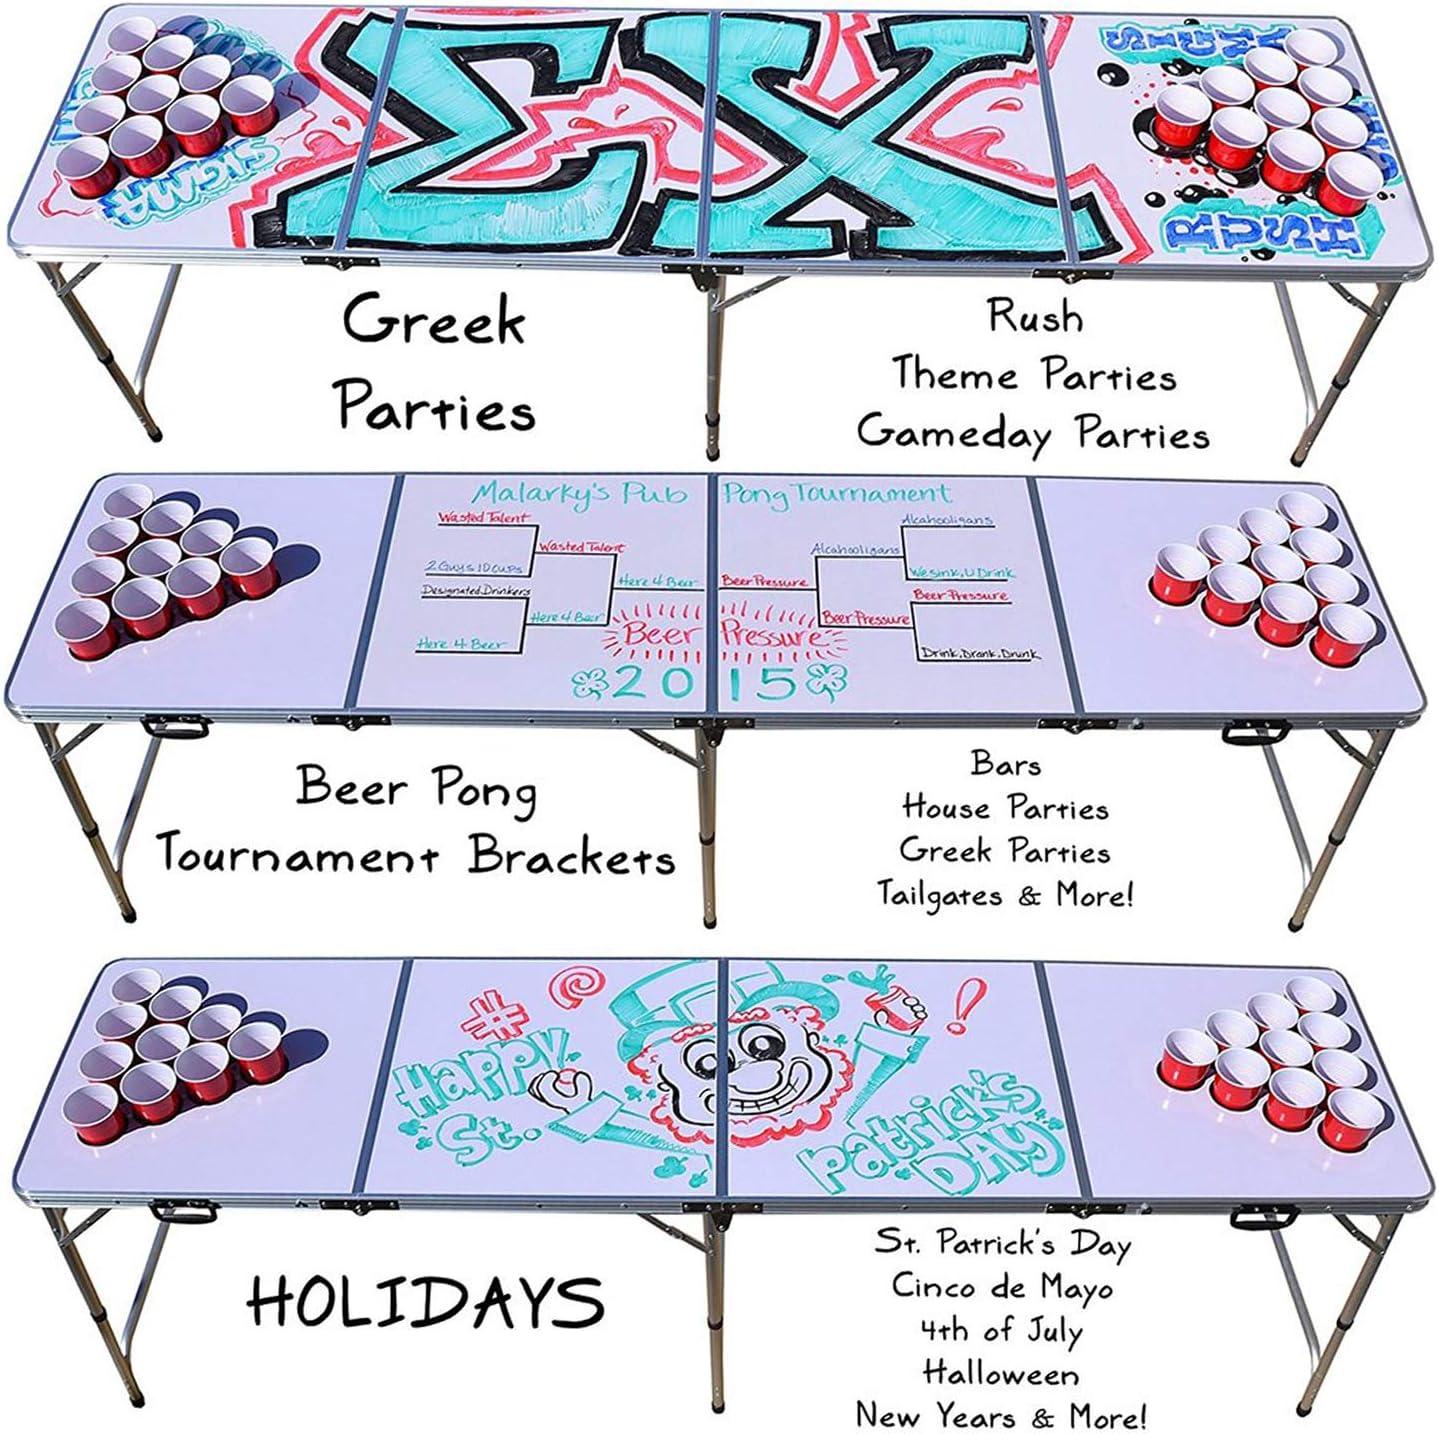 Offizieller Whiteboard Pong Tisch Set | Beer Pong Full Pack | Inkl. 1 Beer Pong Tisch + 120 Becher 53cl (60 Rot & 60 Blau) + 6 Ping-Pong-Bälle | Premium Qualität | Partyspiele | Trinkspiele Table + Cups + Balls